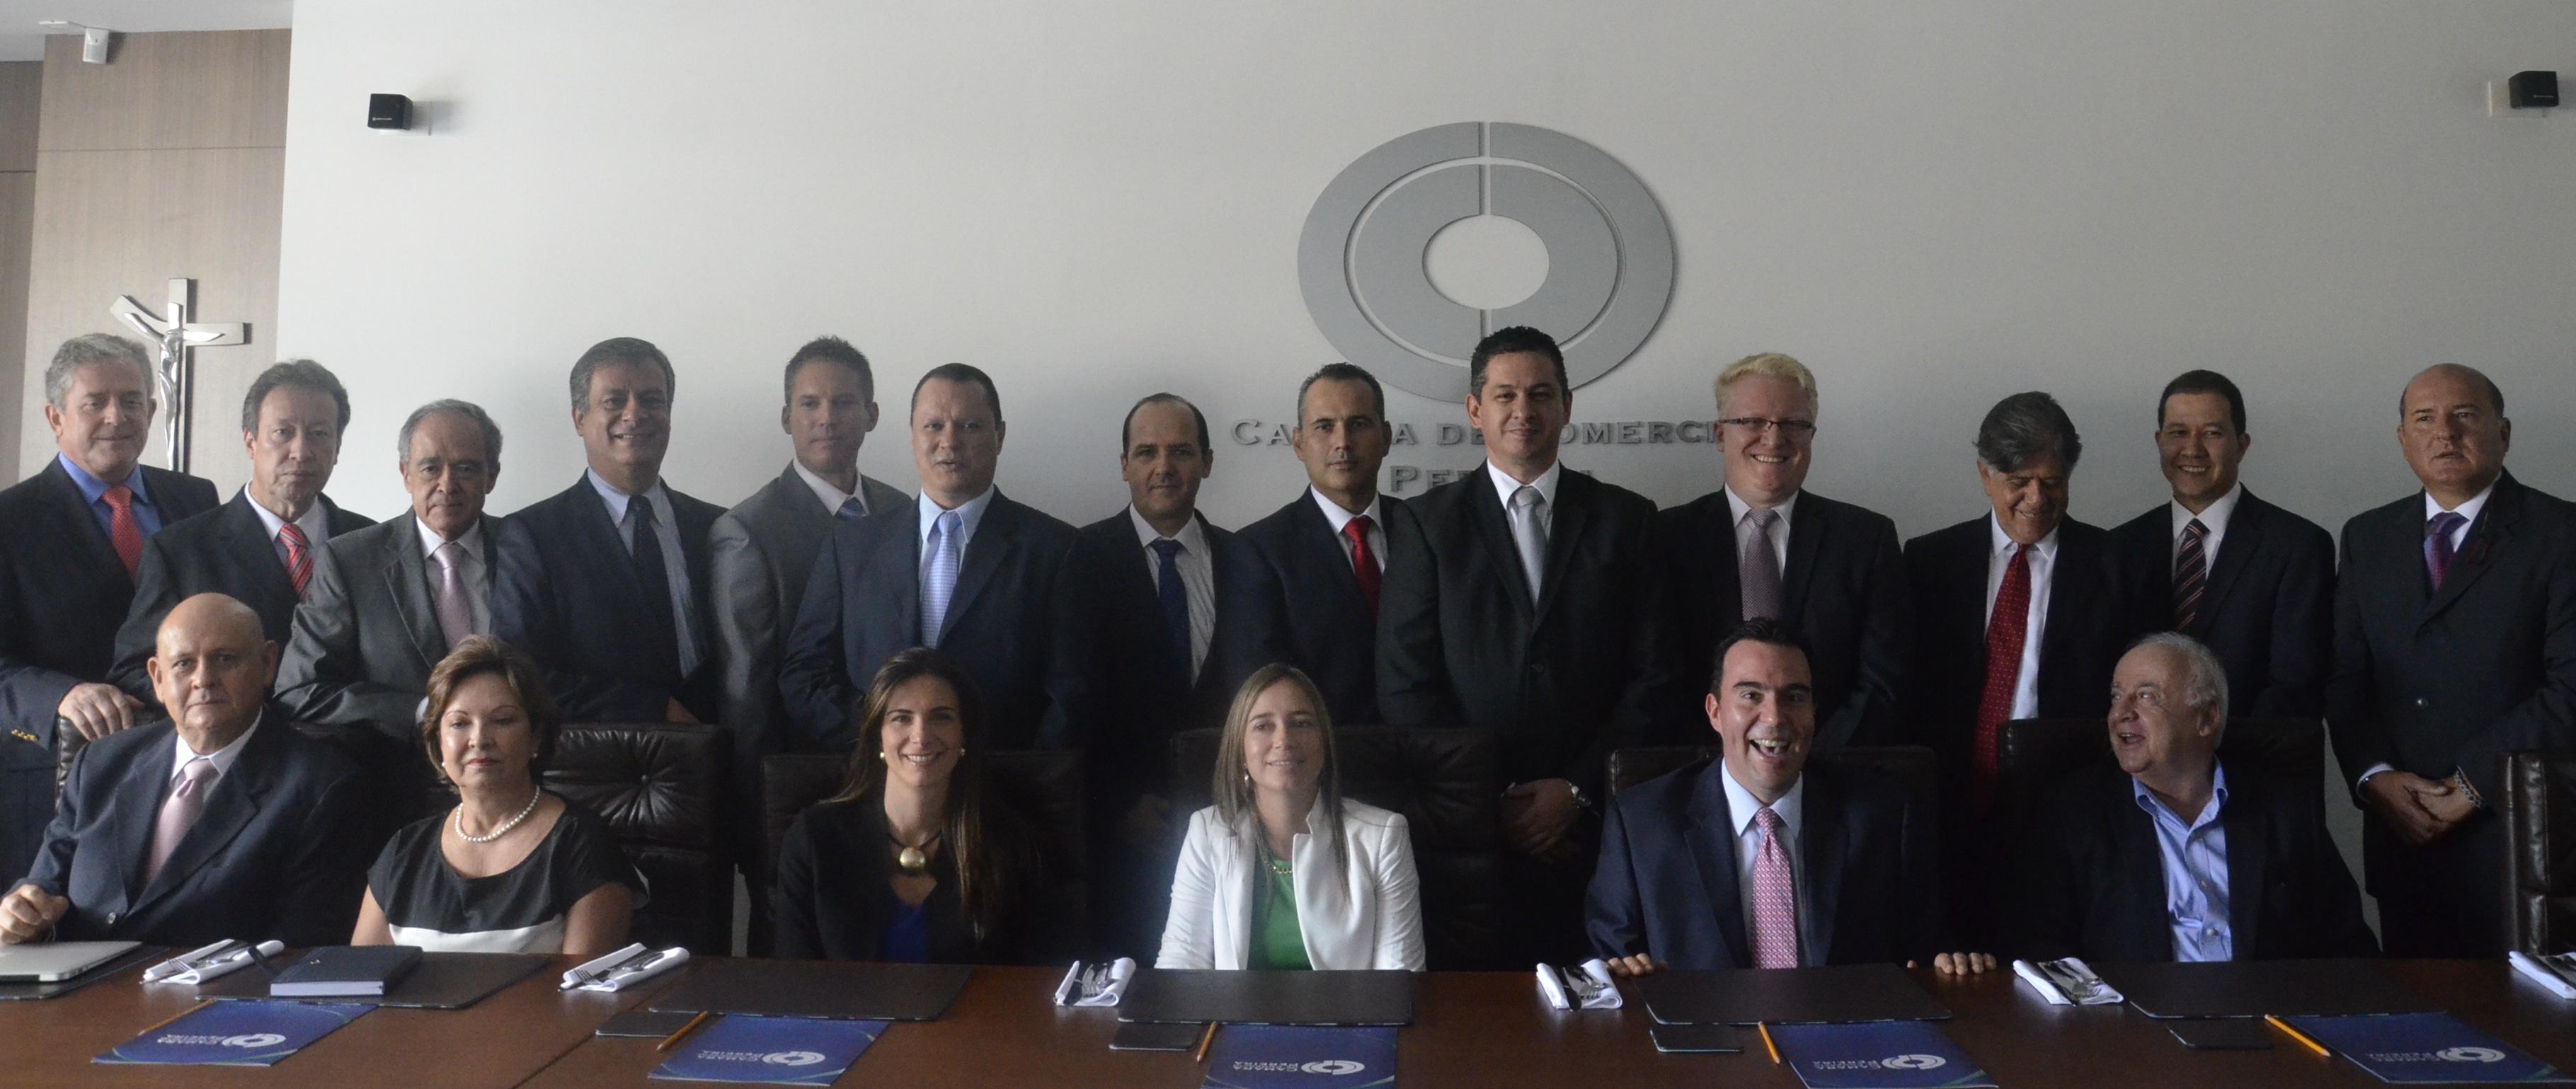 Resultado de imagen para Empresarios se reunieron en Pereira